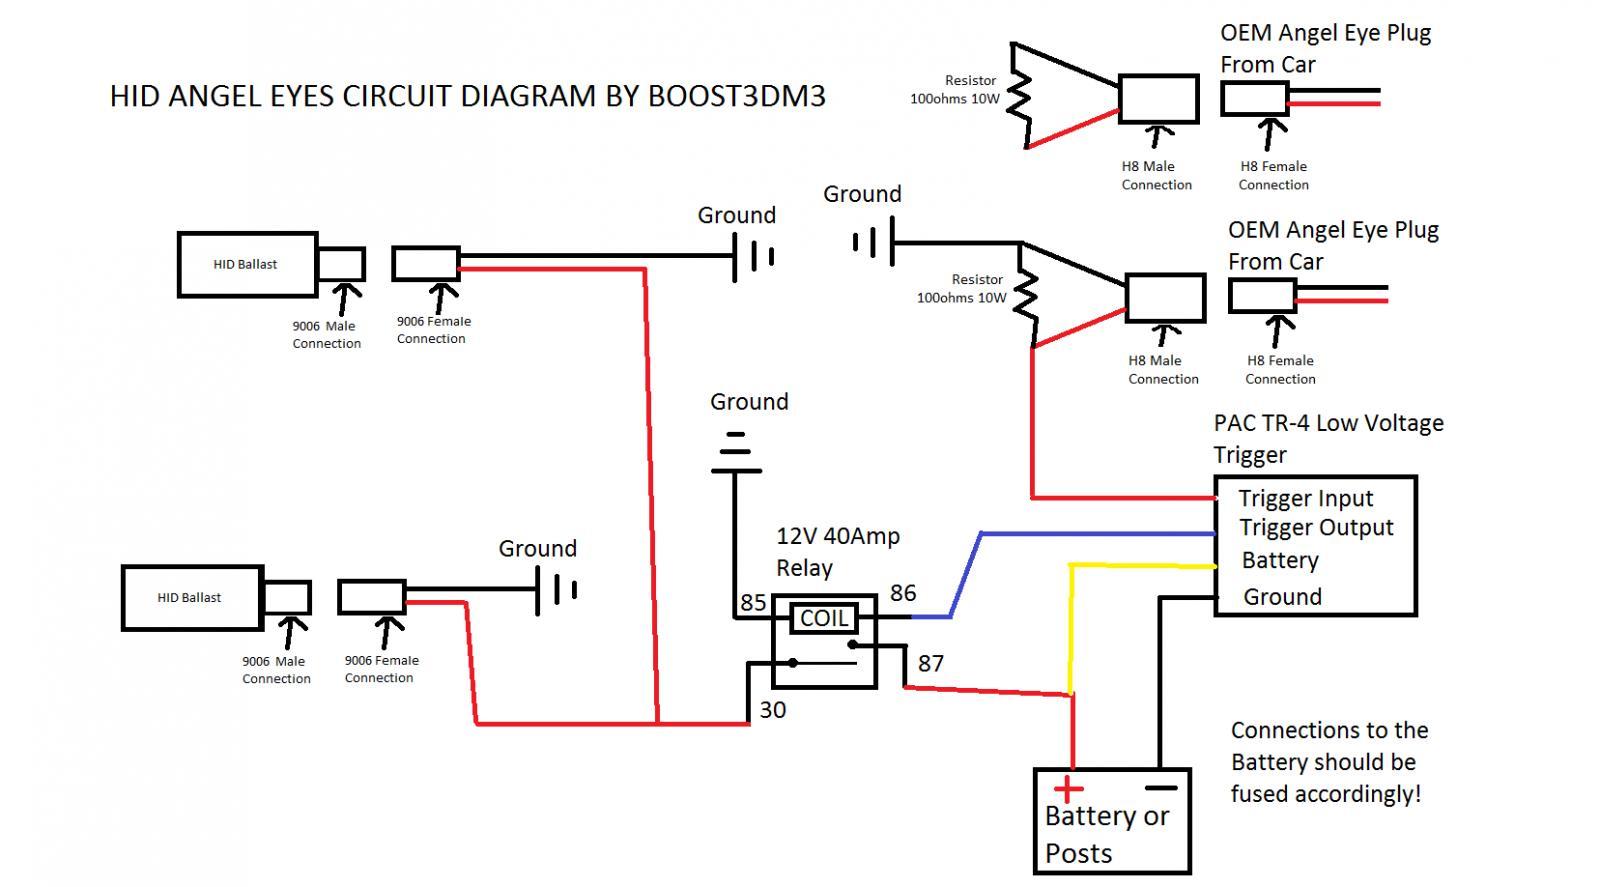 Camaros Kit Replacment